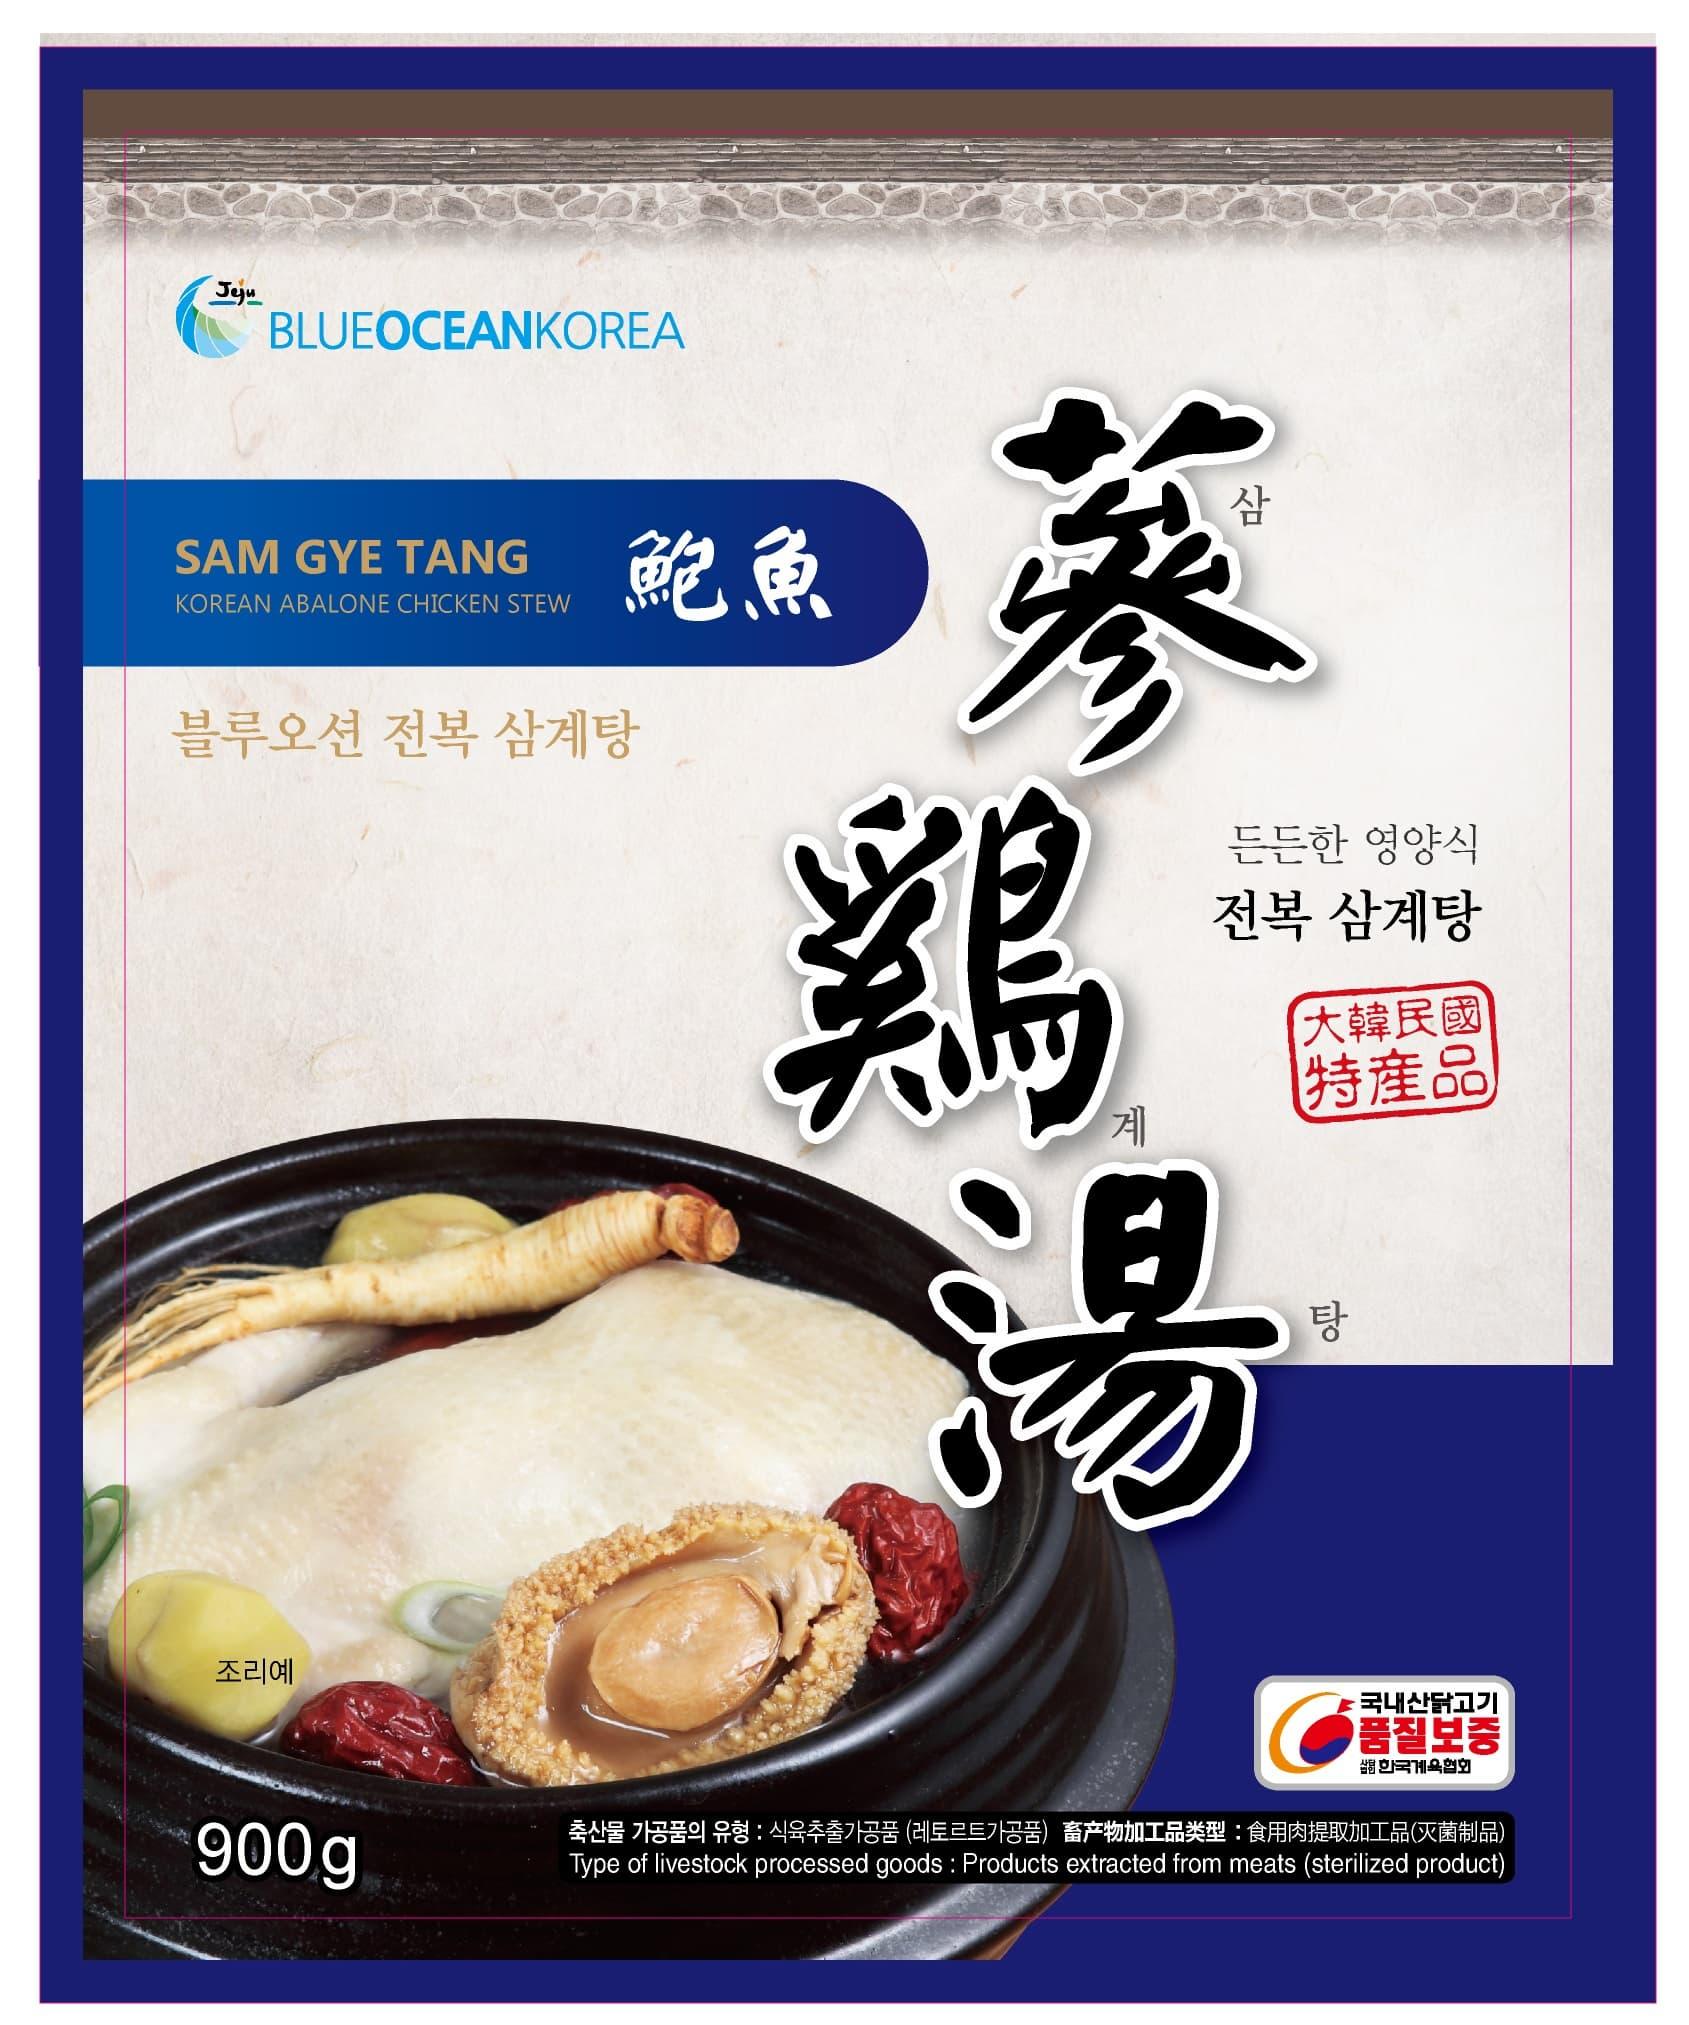 Abalone SAMGYETANG, JEJU BLUEOCEAN KOREA